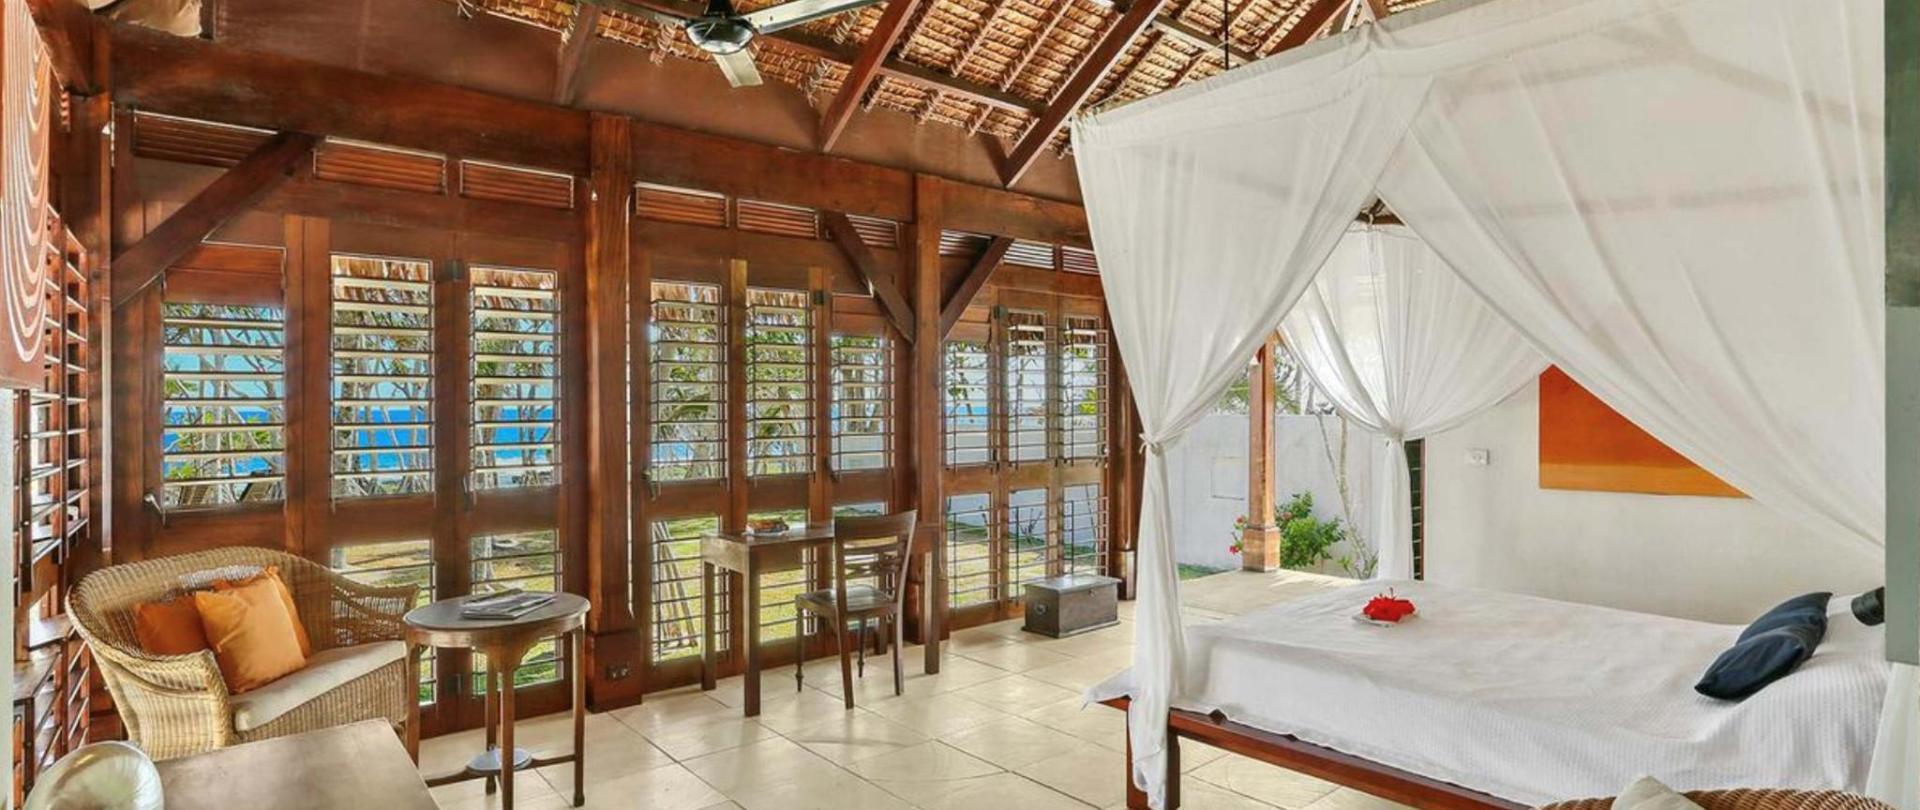 Sarangkita Beach Front Villa